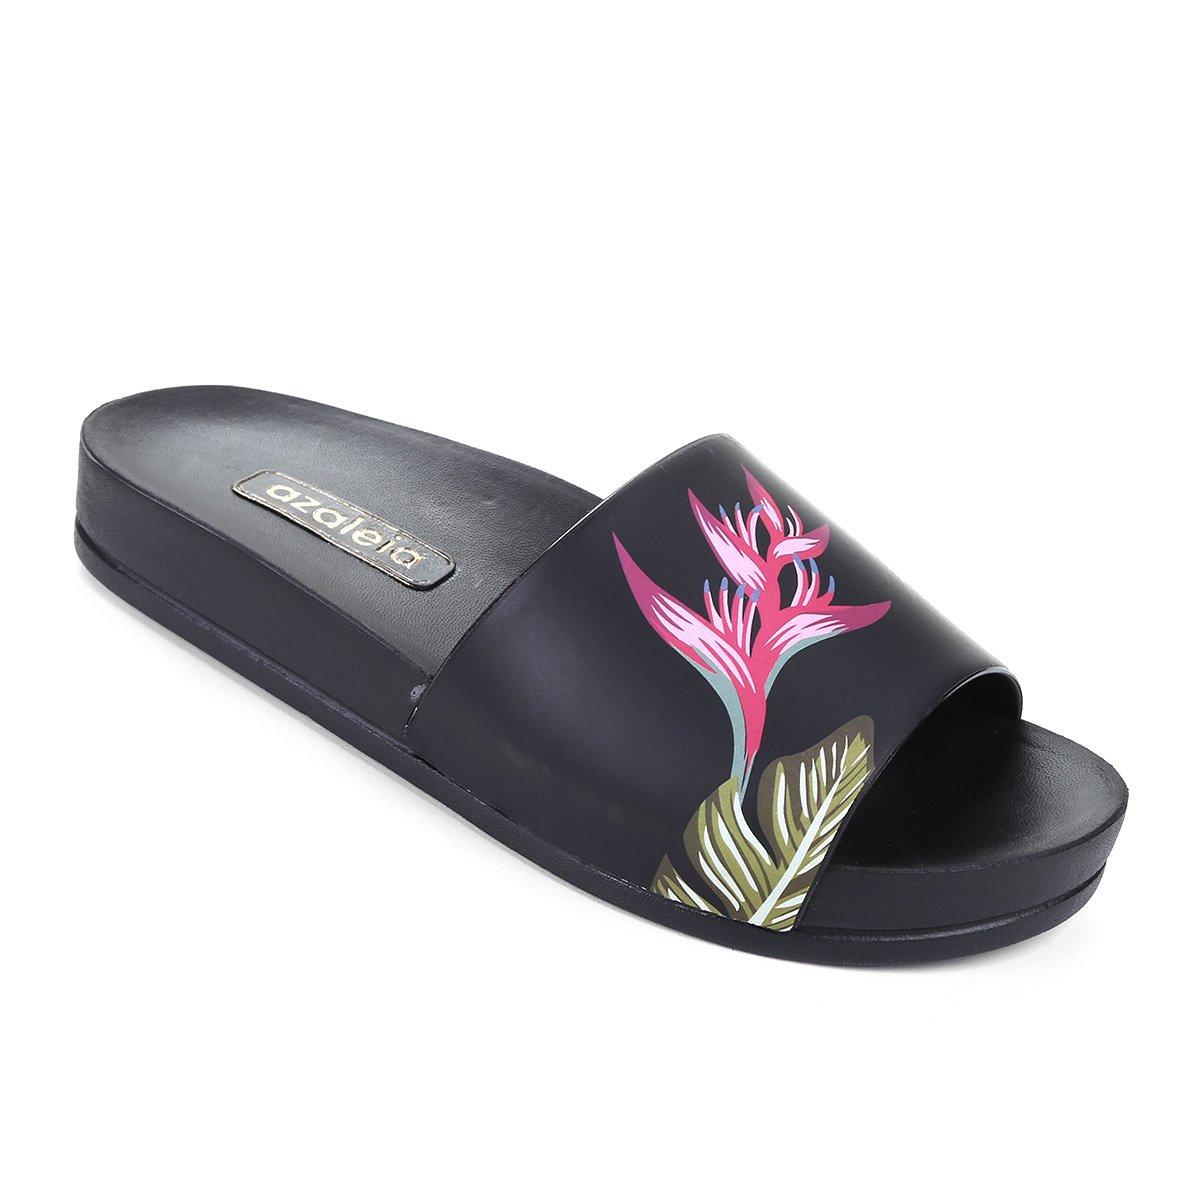 e76f6dd88f Chinelo Azaleia Slide Estampa Tropical Feminino - Preto e Pink